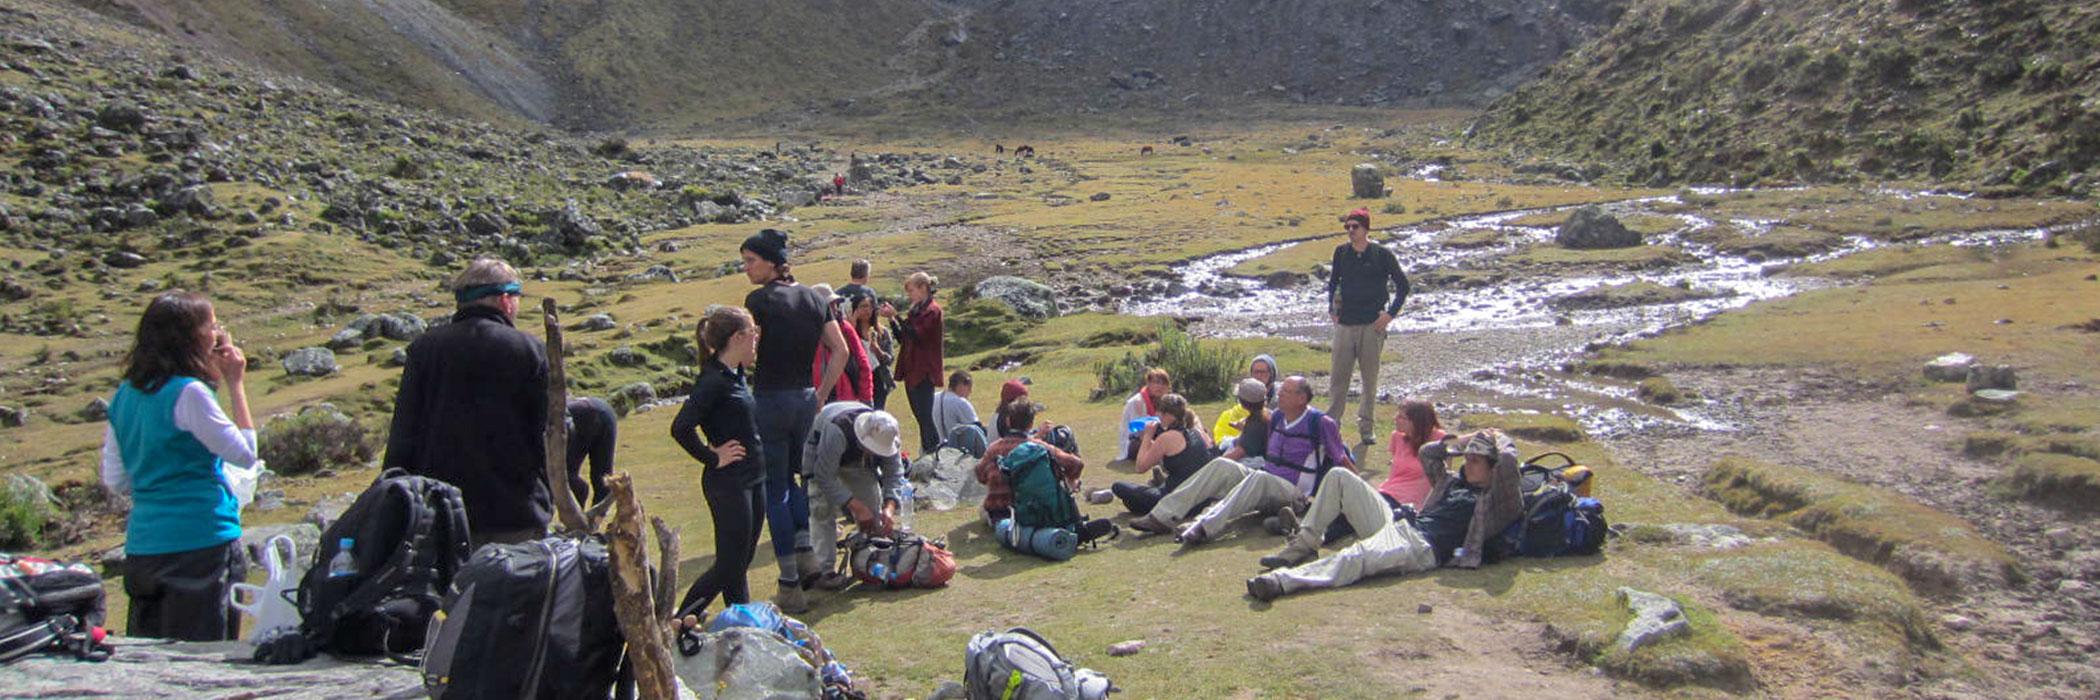 machu picchu salkantay trek 4 days (1)